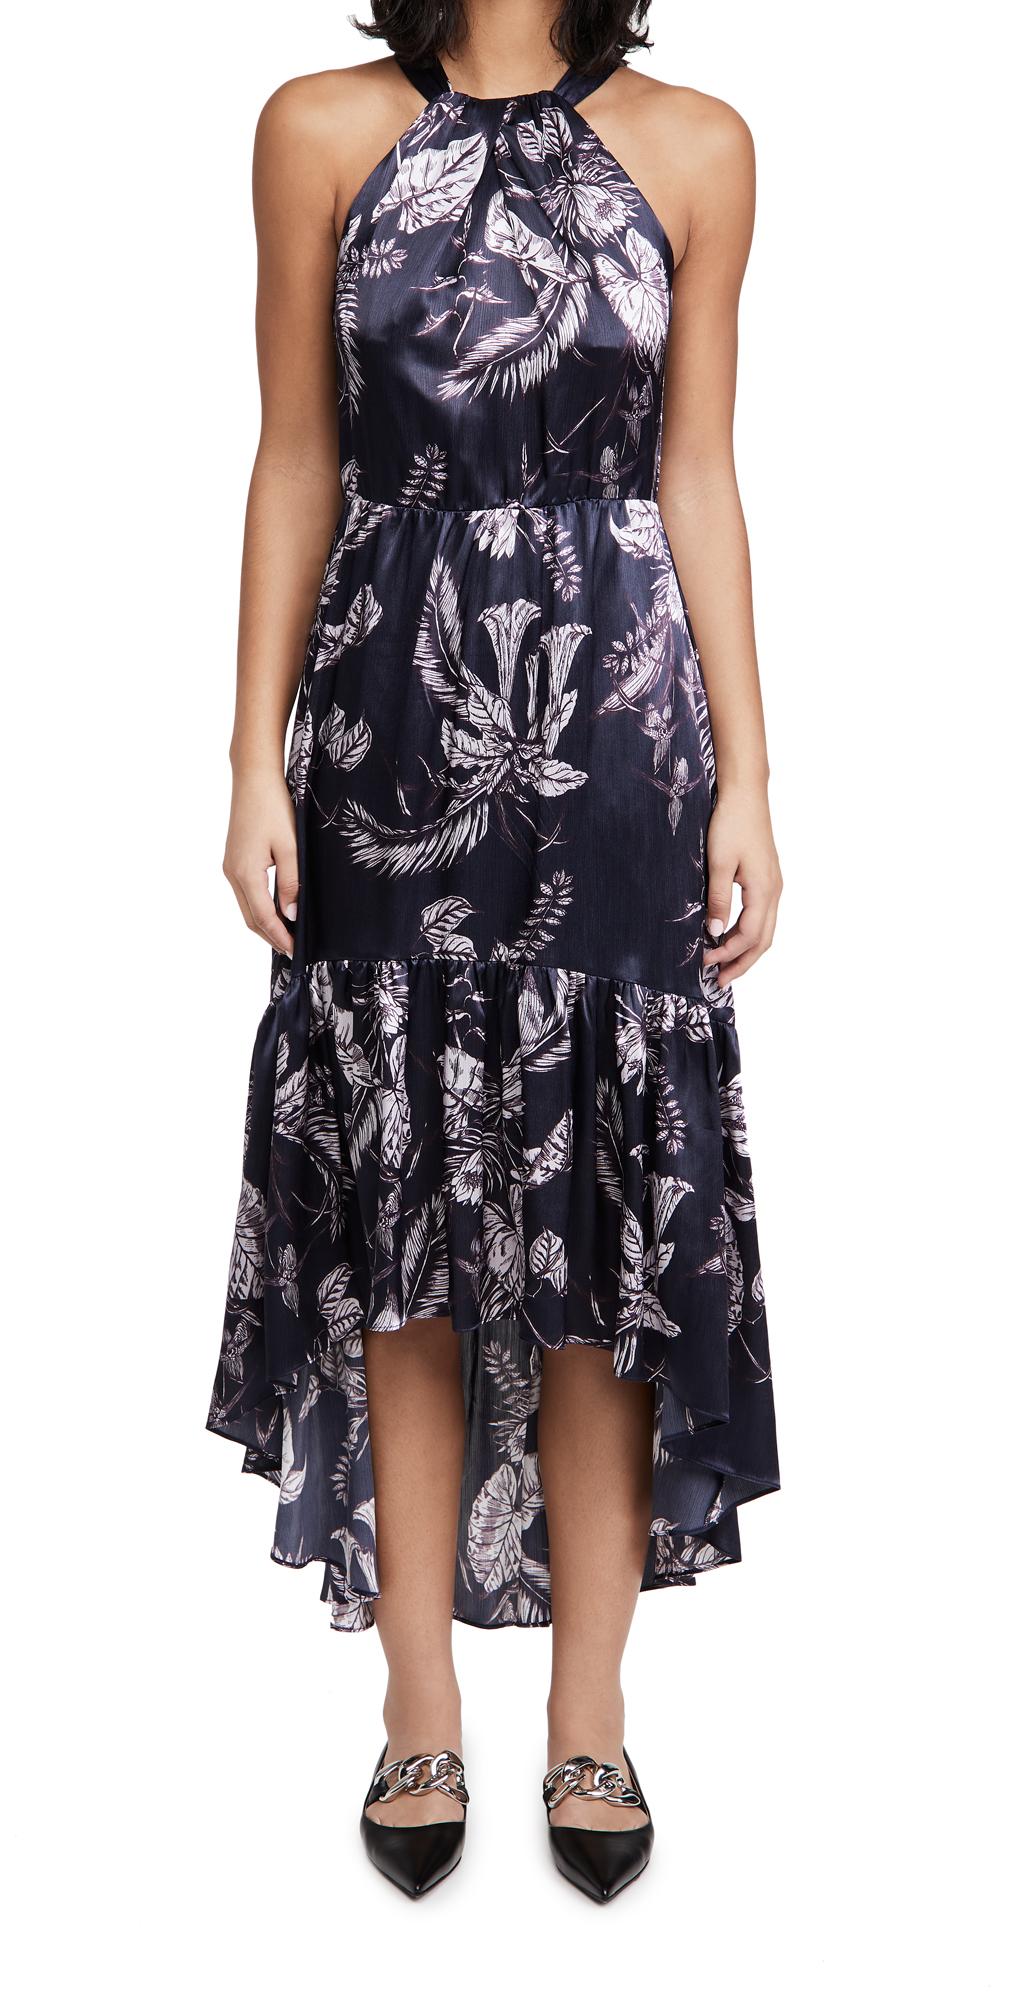 Marchesa Notte Printed Sleeveless Halter Neck Dress